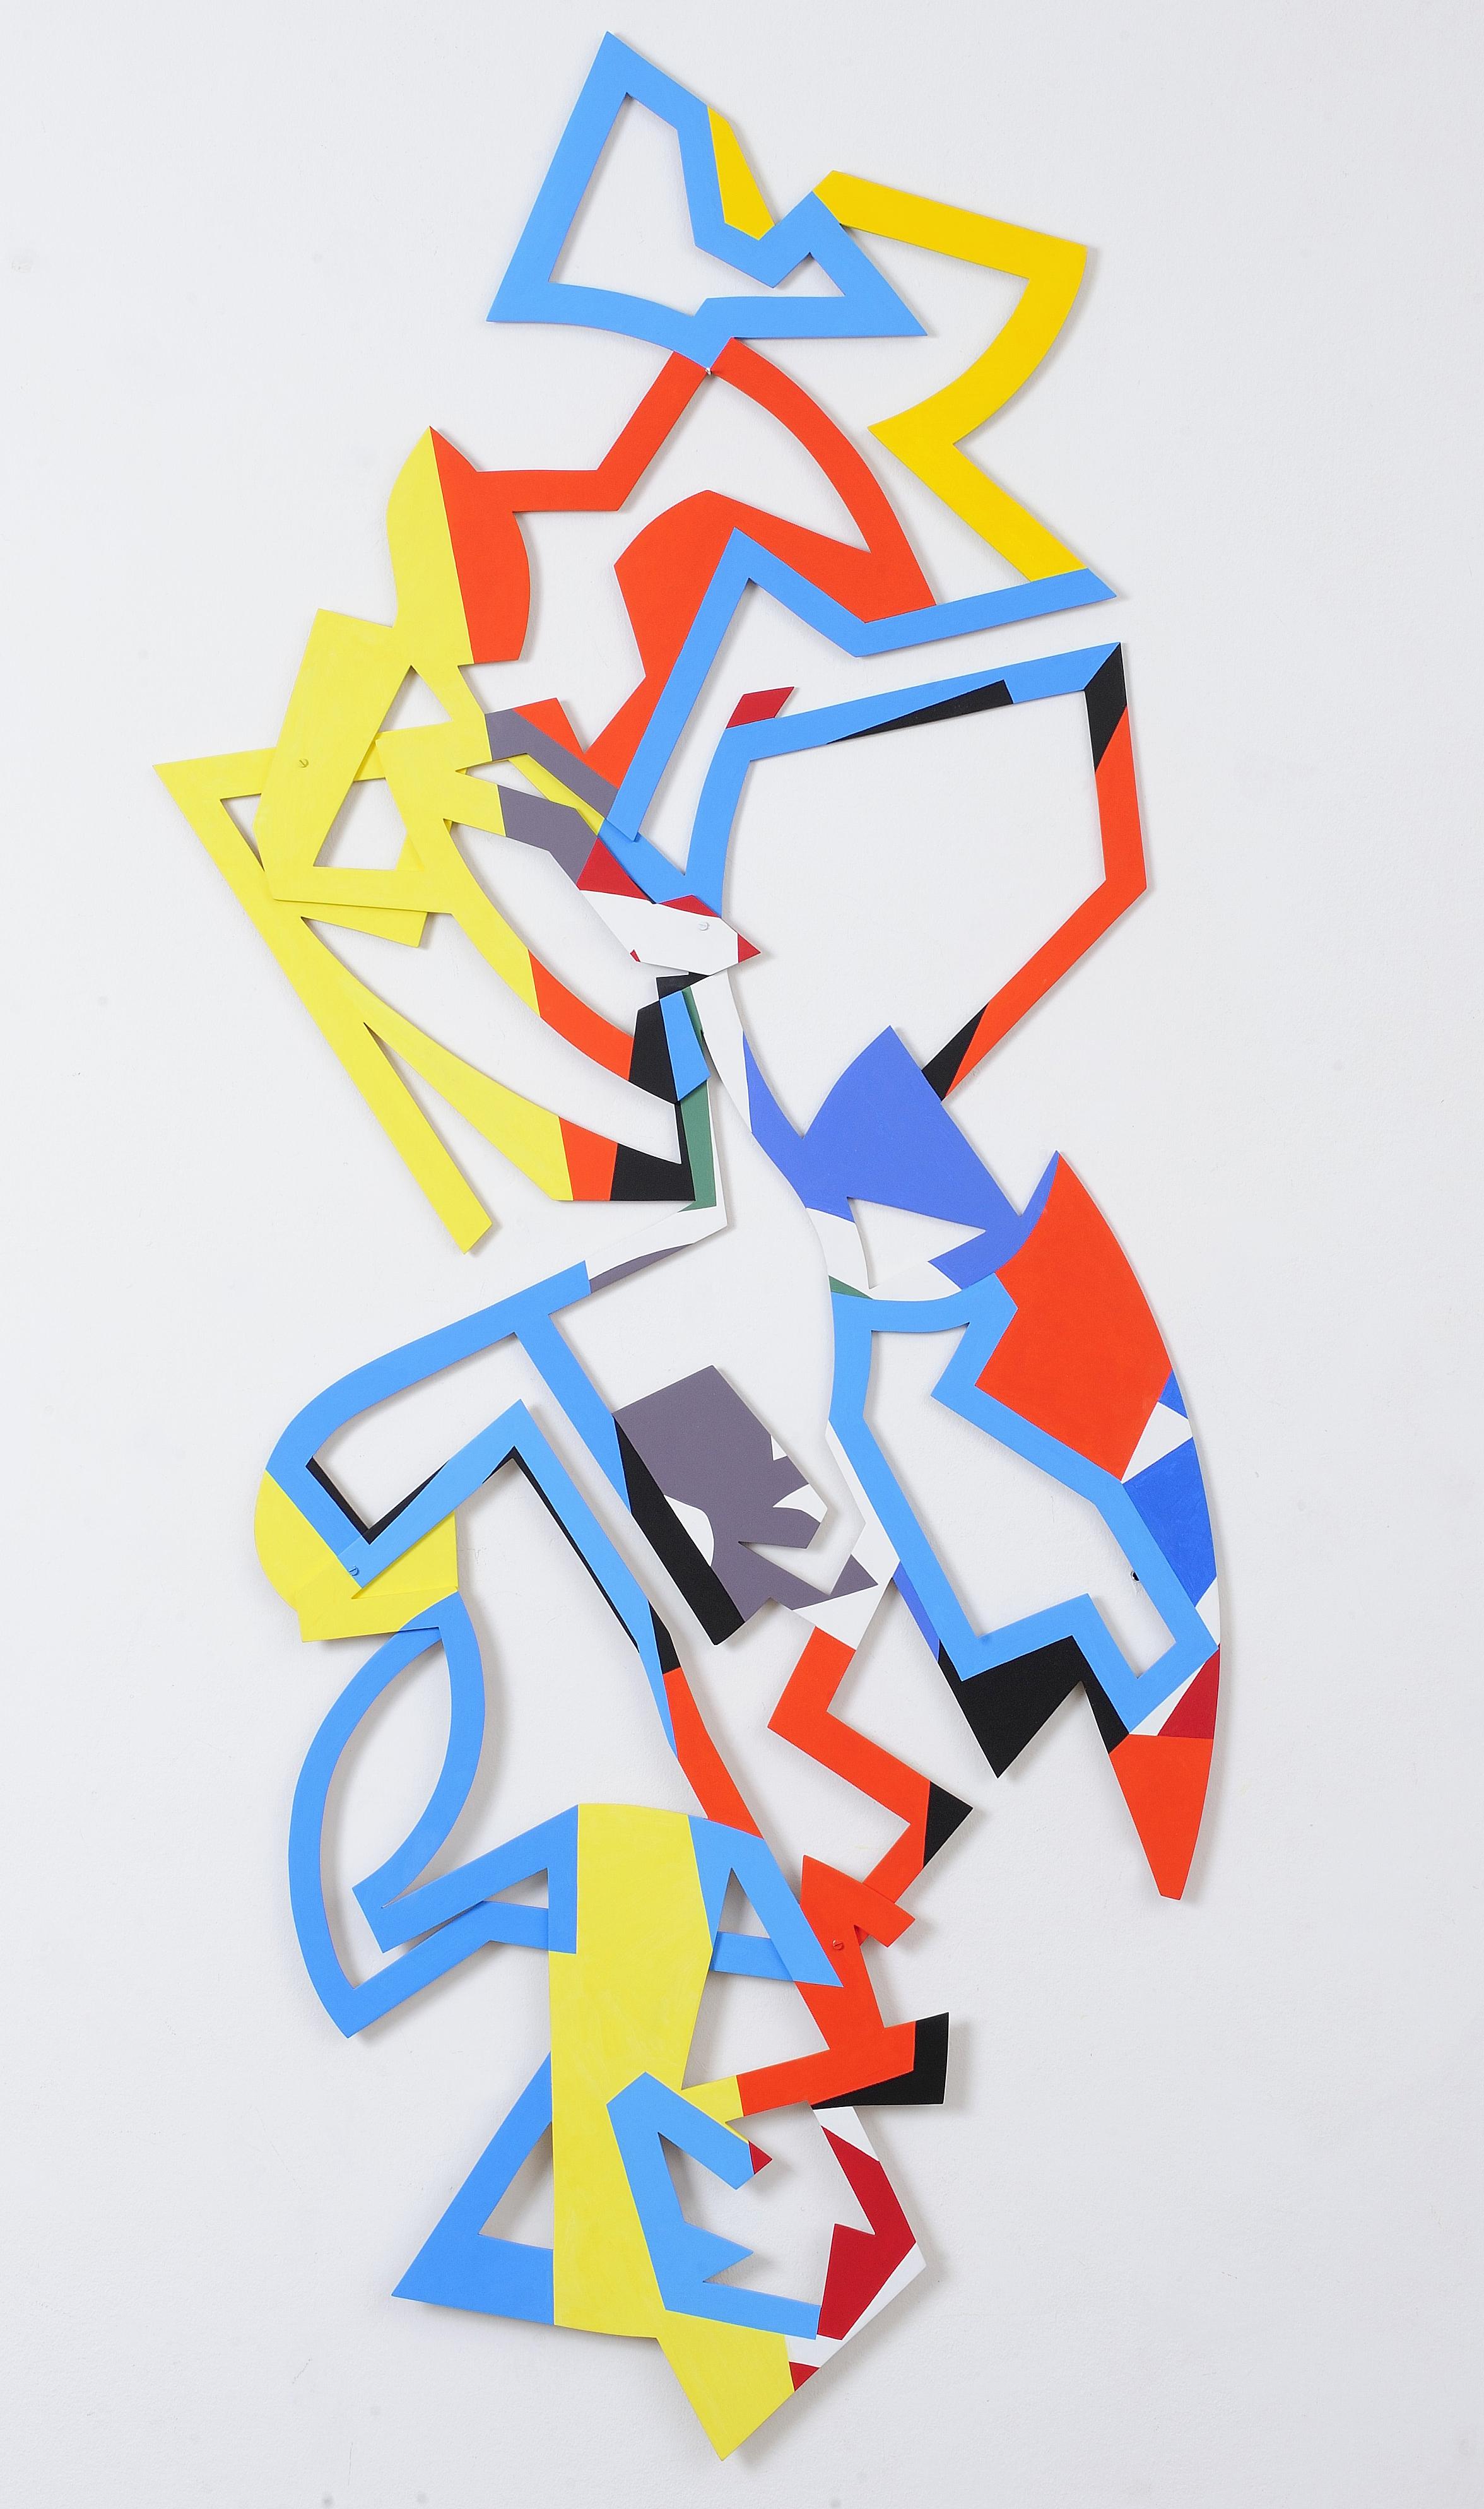 Birgit Zinner: Ramses, 2013